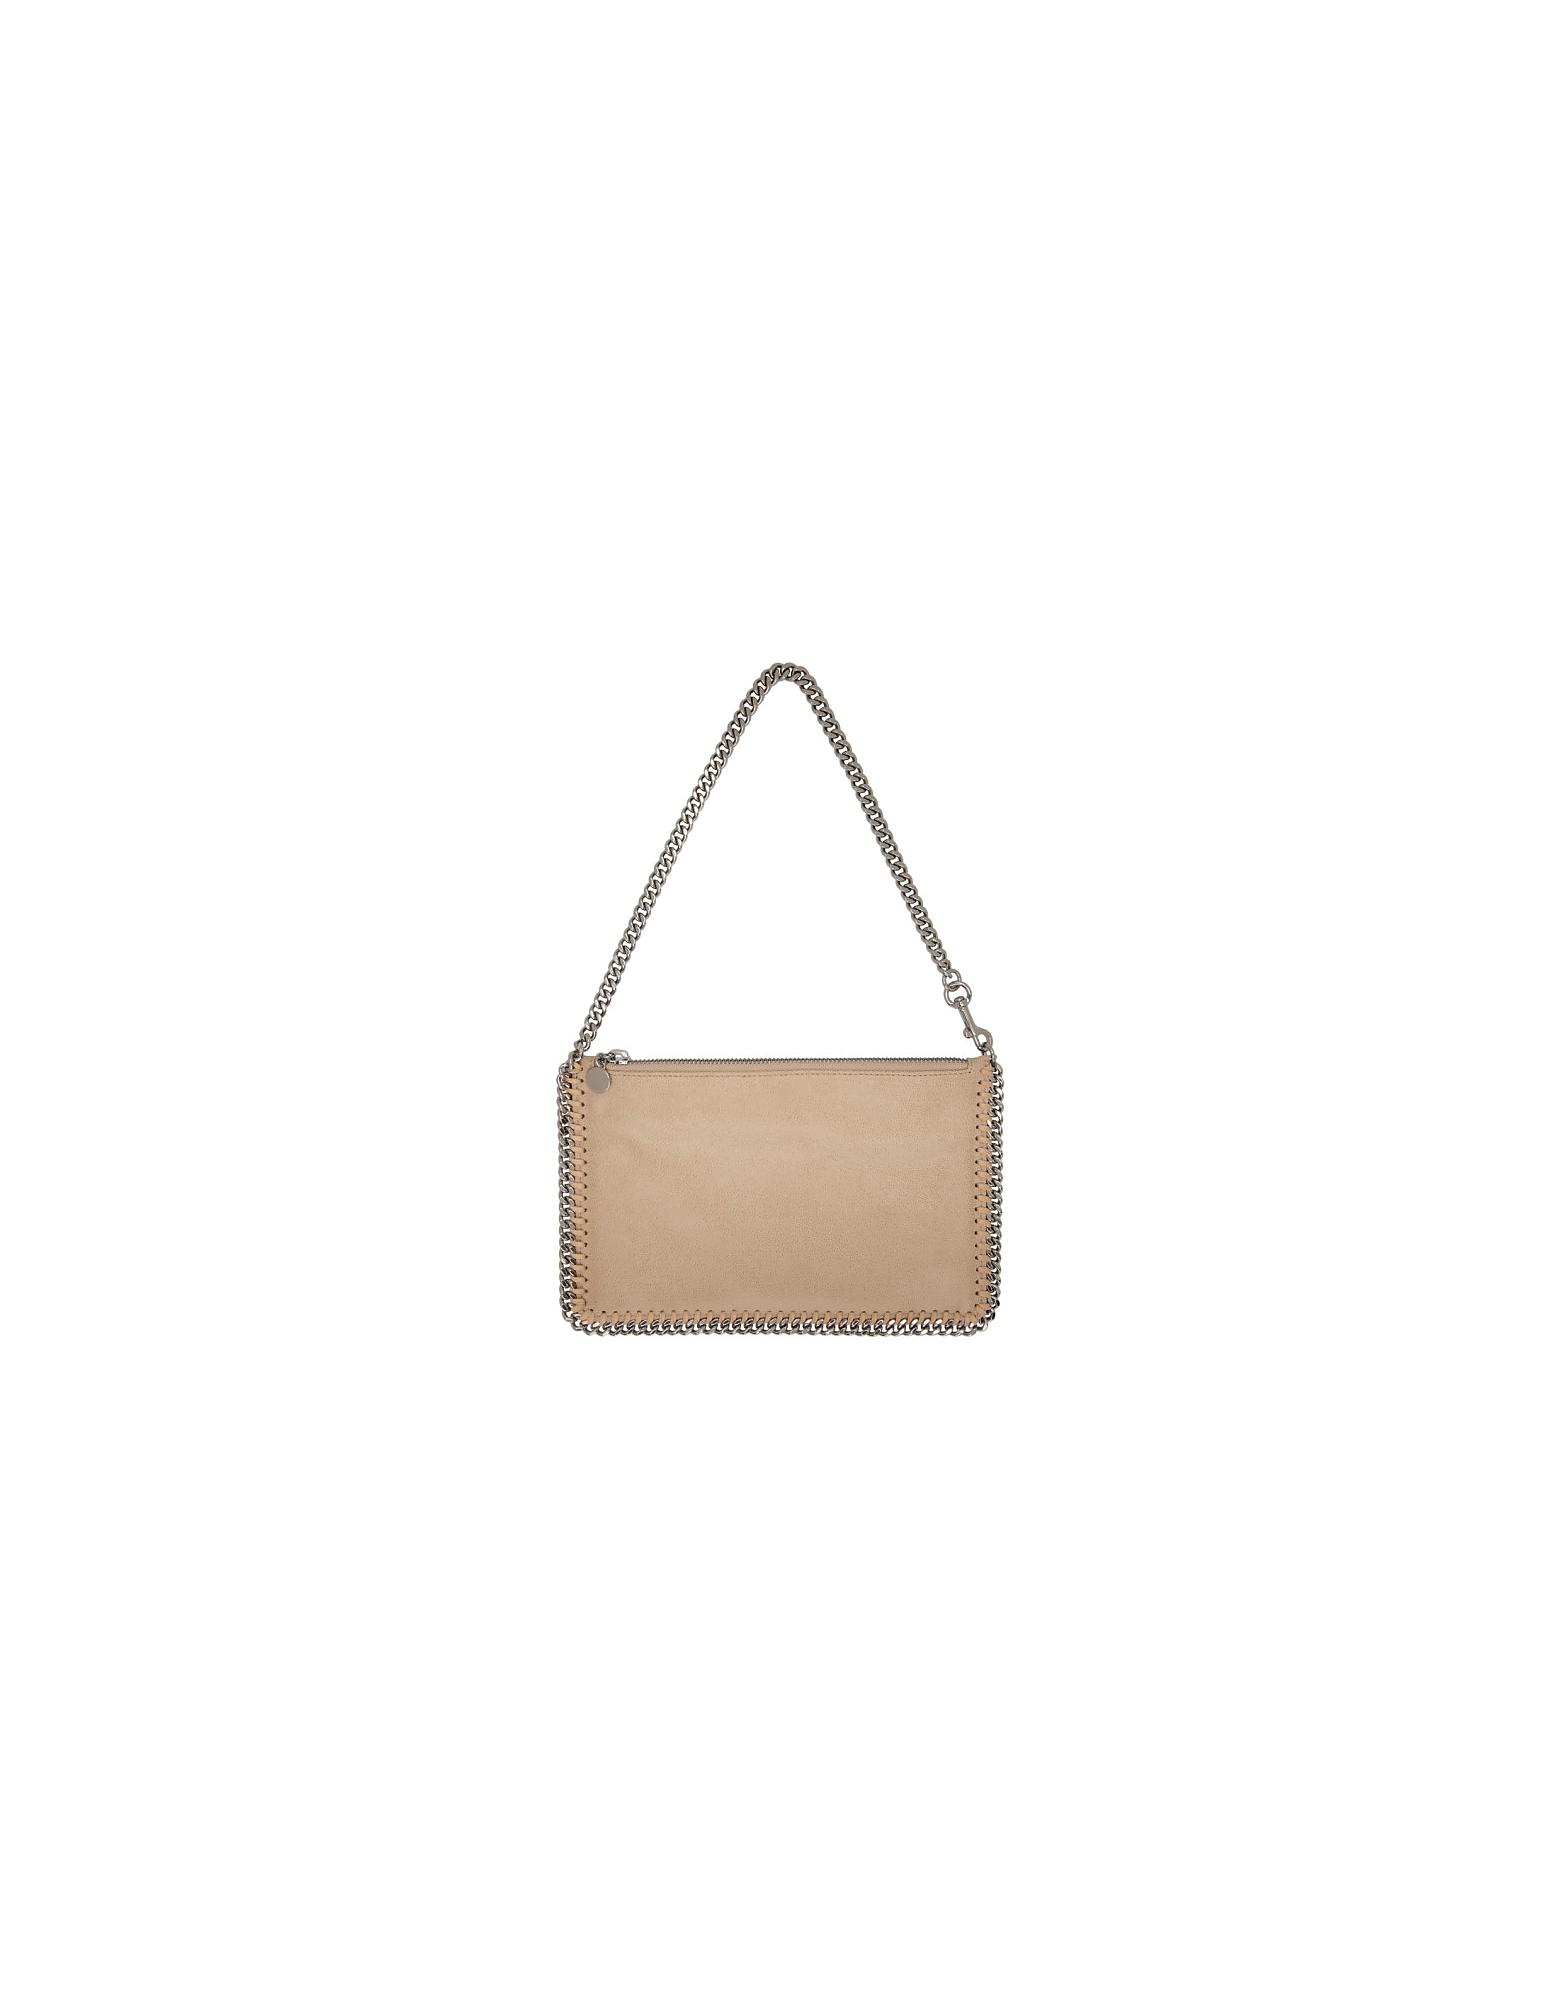 Stella McCartney Designer Handbags, Beige Falabella Pouch